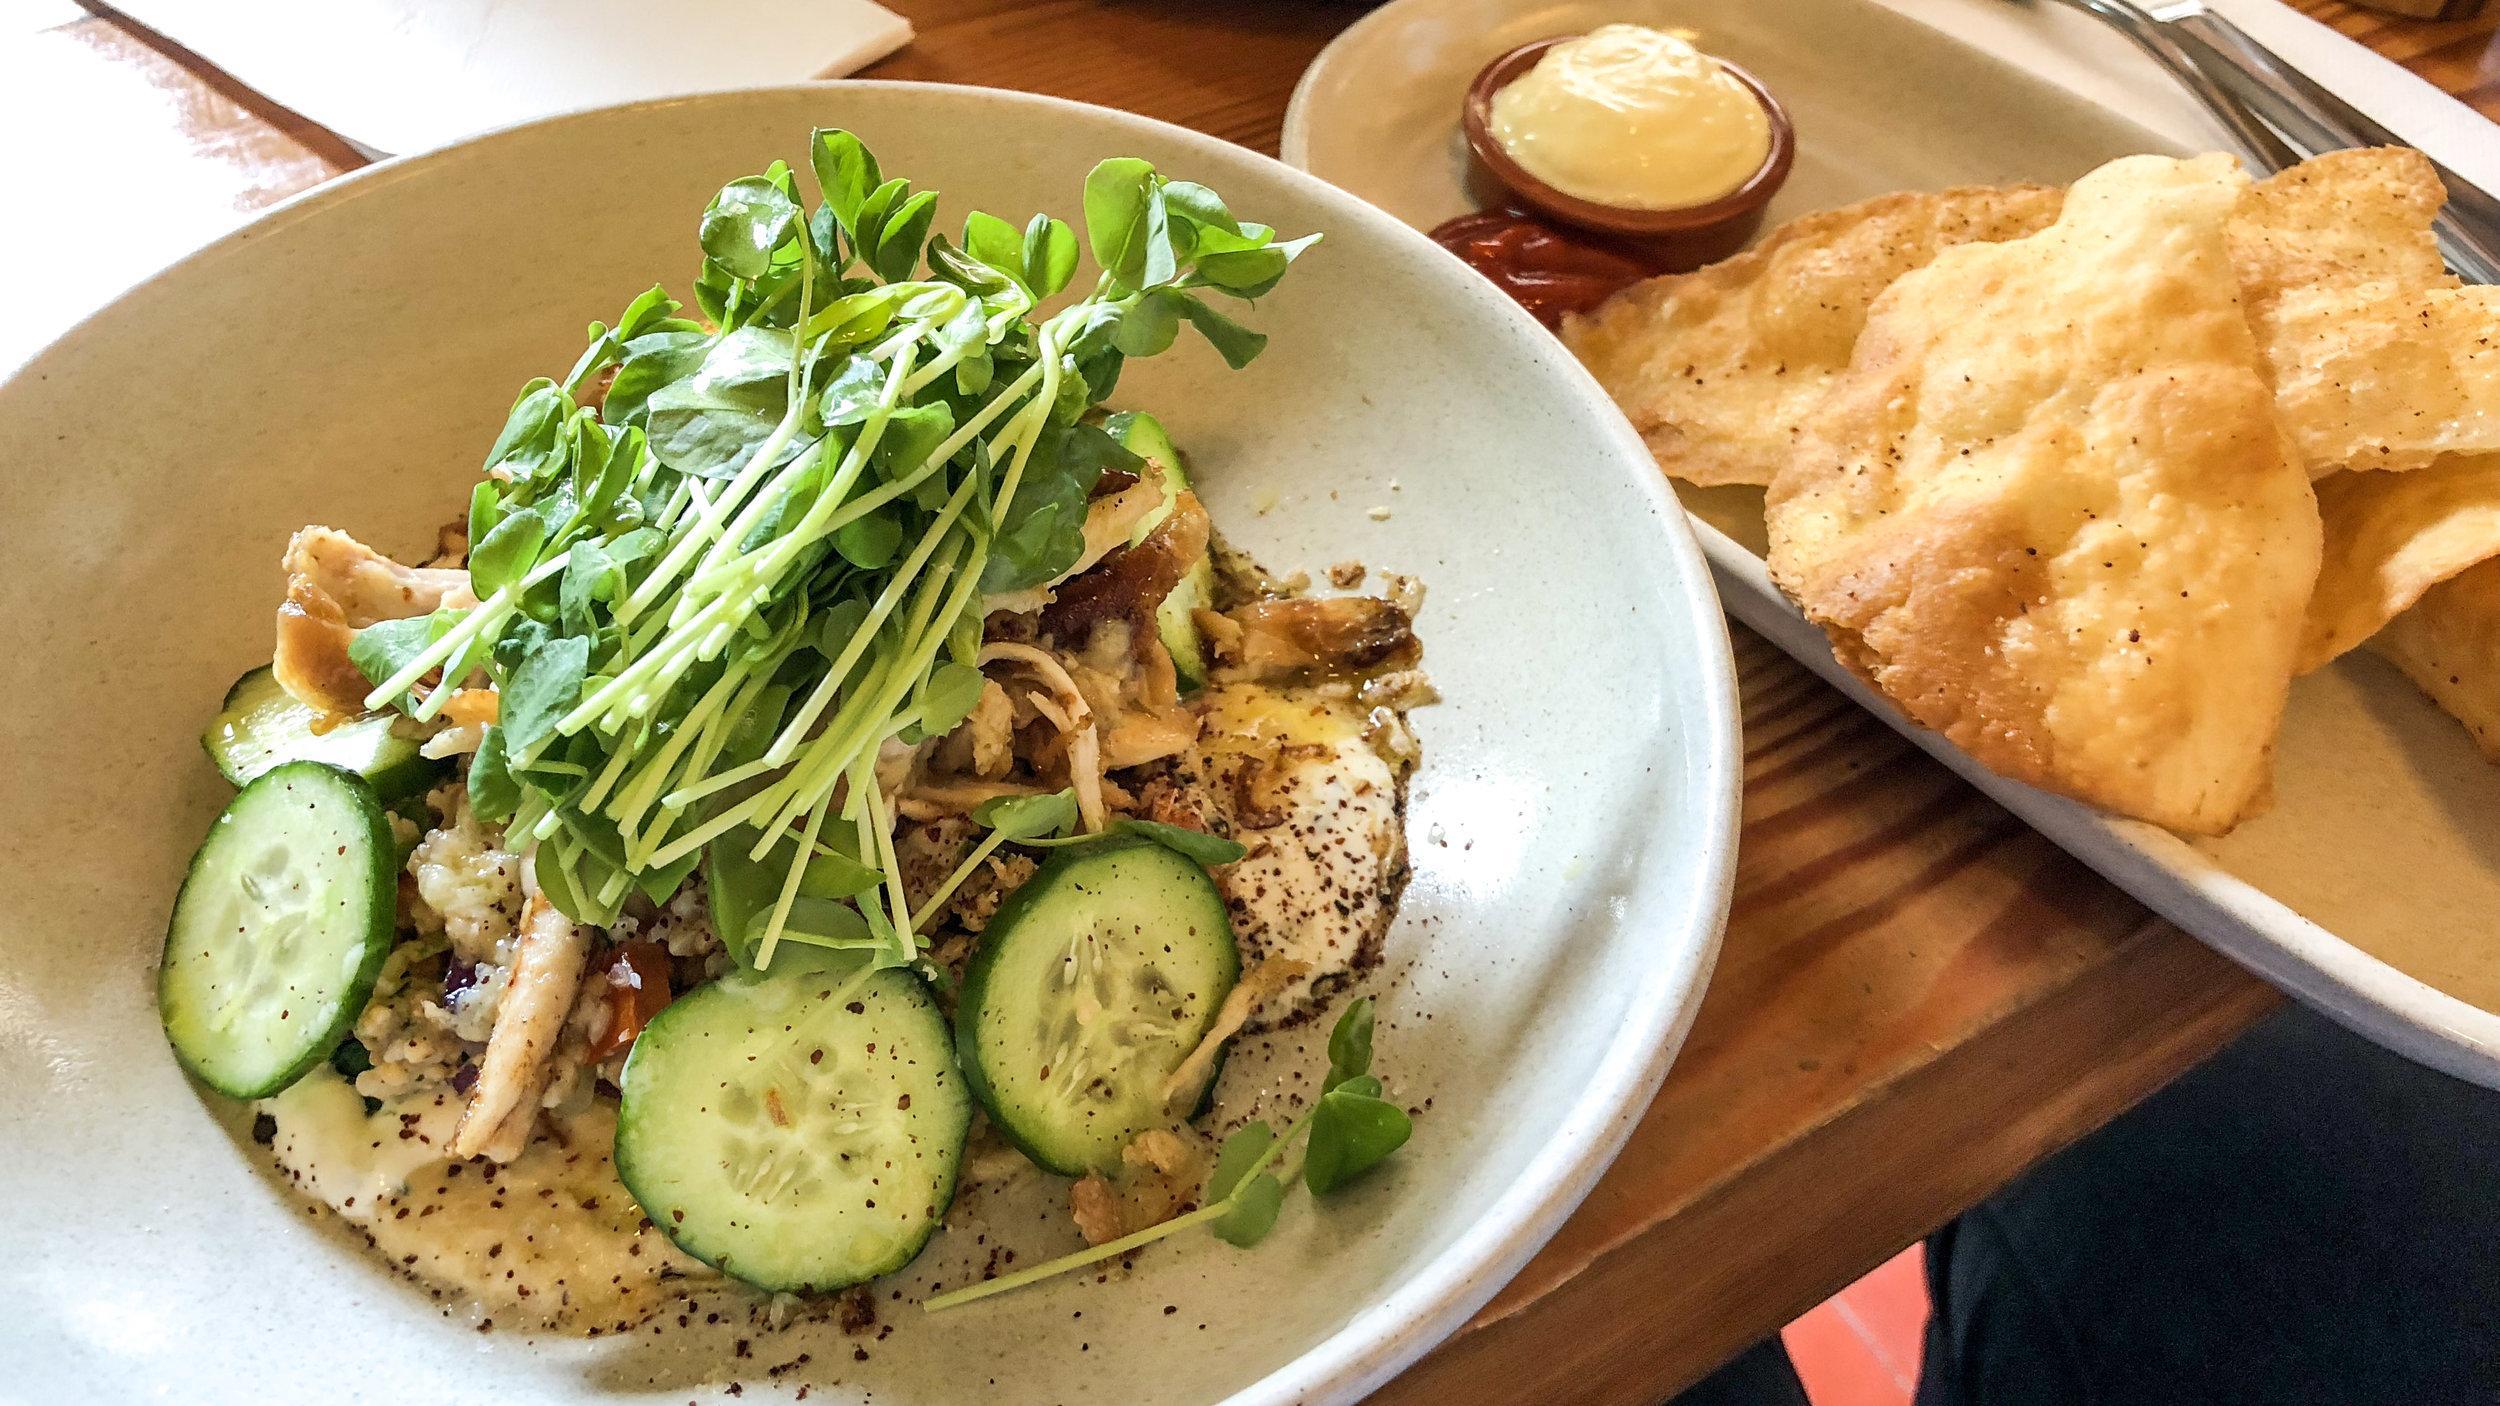 josephhyde_joseph_hyde_potts_point_sydney_darlinghurst_kingscross_cbd_restaurant_diner_cafe_eatery_brunch_breakfast_lunch_chicken_salad_garlic_roasted_toum_crisps